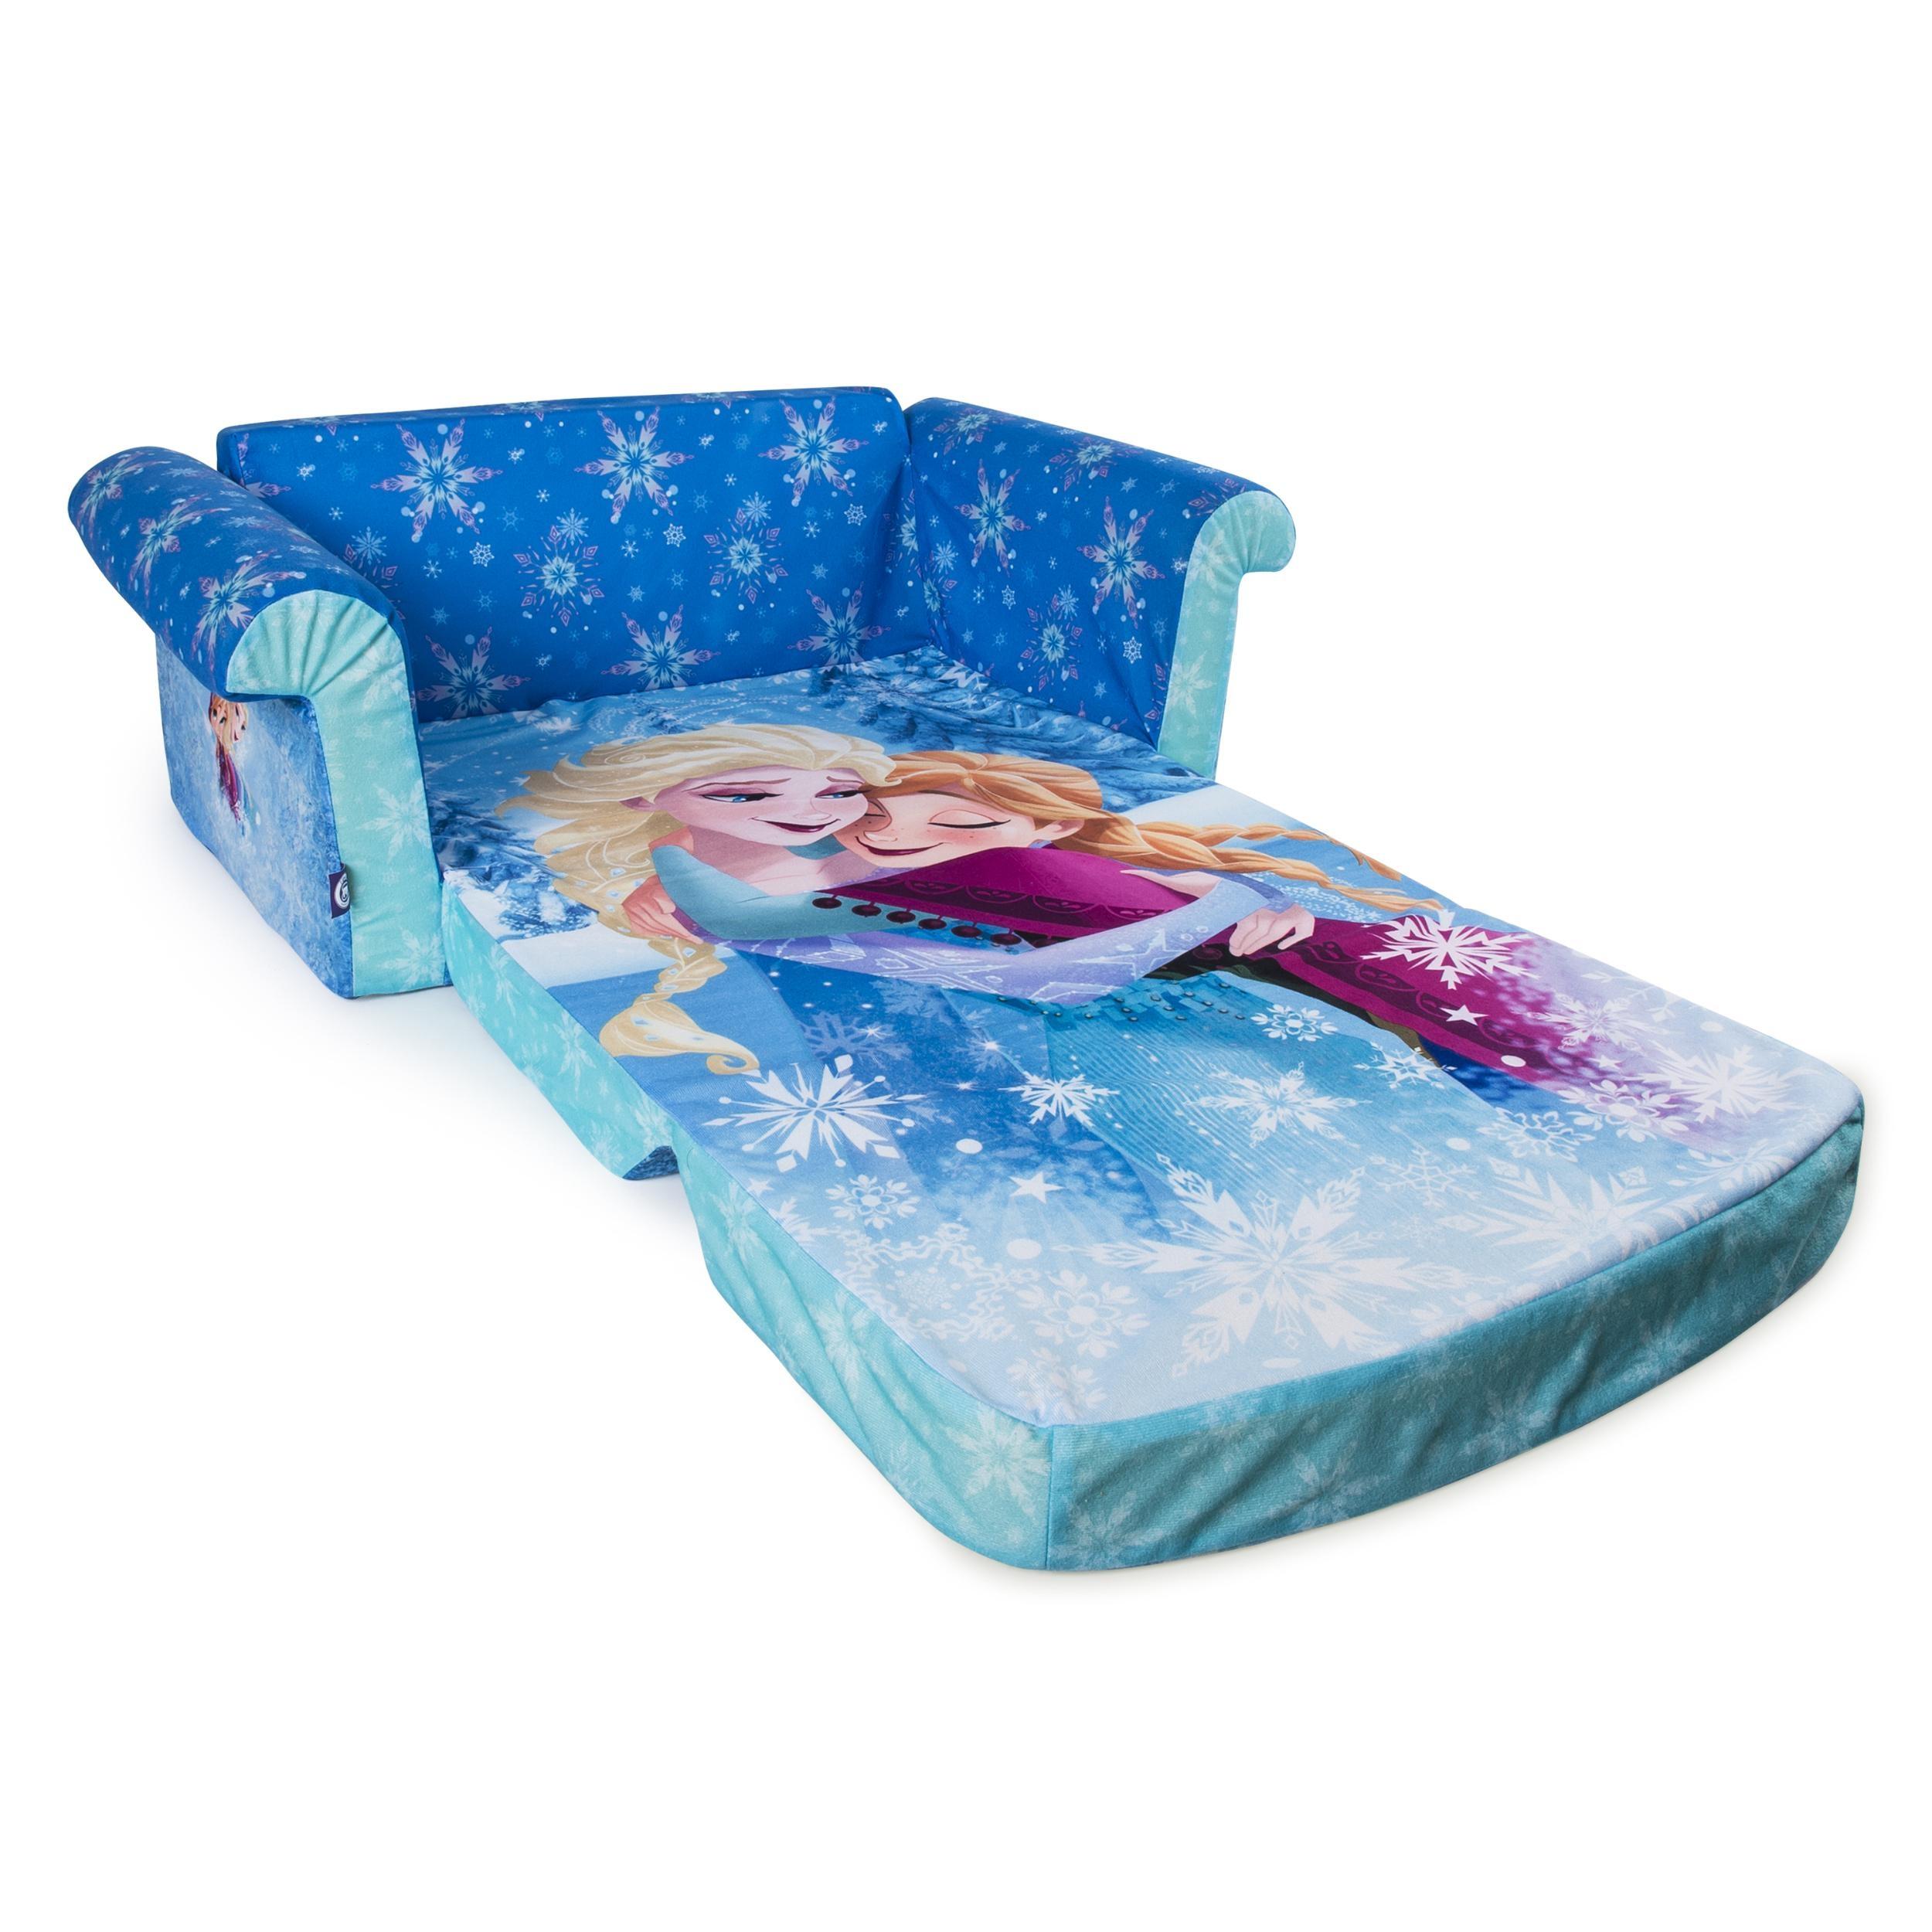 Marshmallow Furniture, Children's 2 In 1 Flip Open Foam Sofa In Princess Flip Open Sofas (Image 11 of 20)